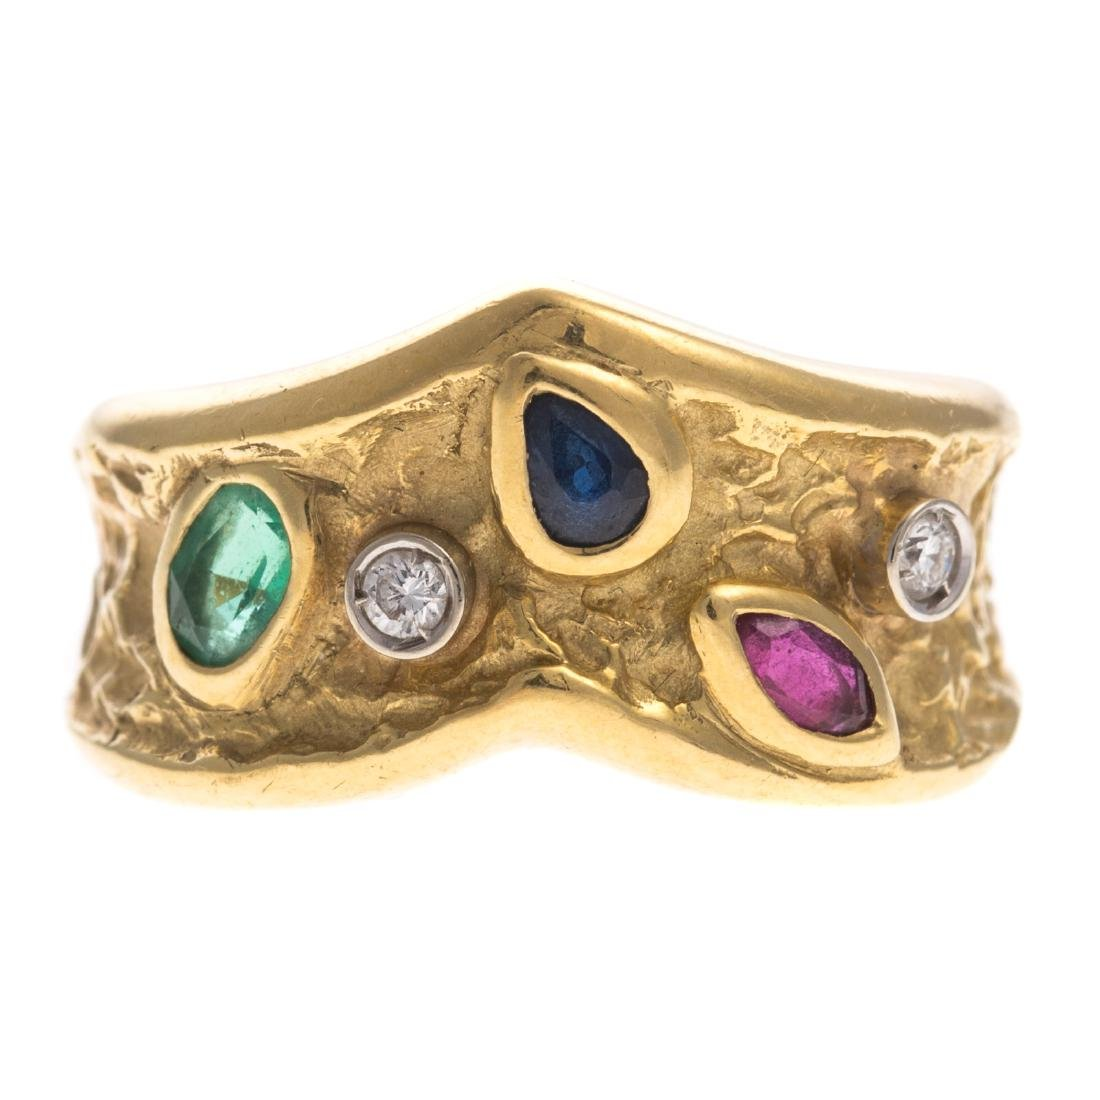 A Ruby, Sapphire, Emerald & Diamond Ring in 18K